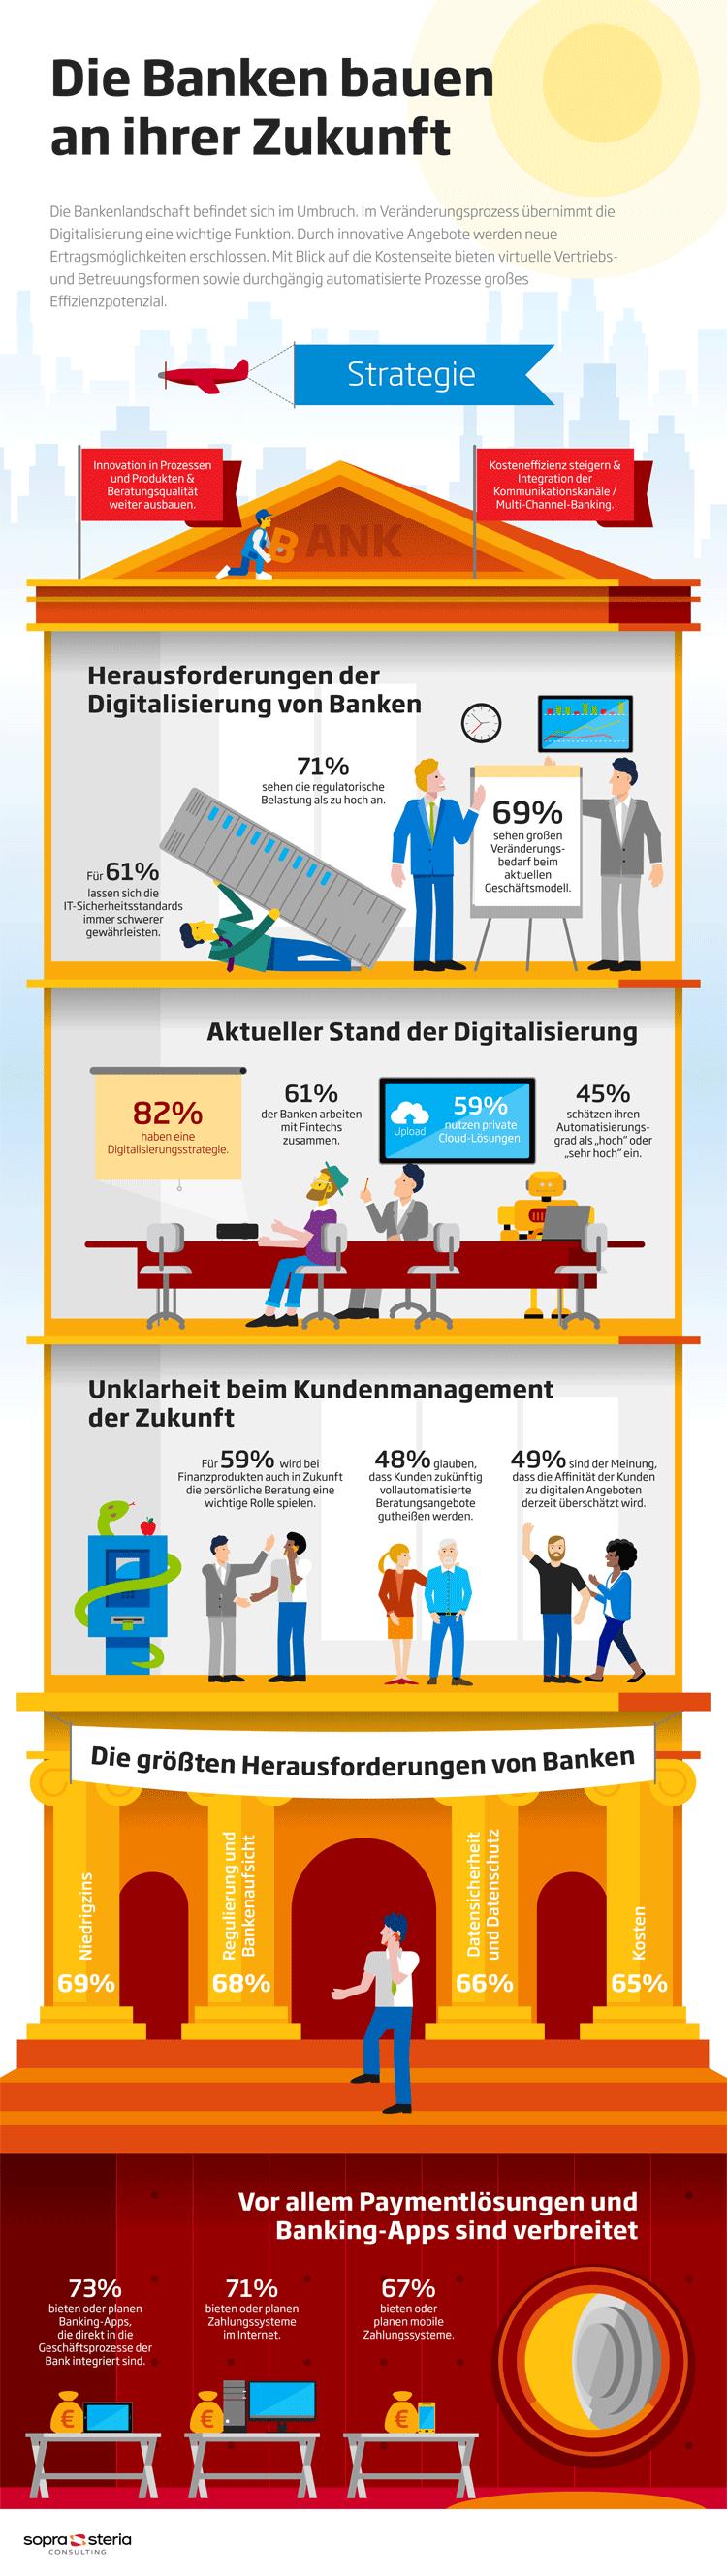 Infografik: Digitalisierung deutsche Banken